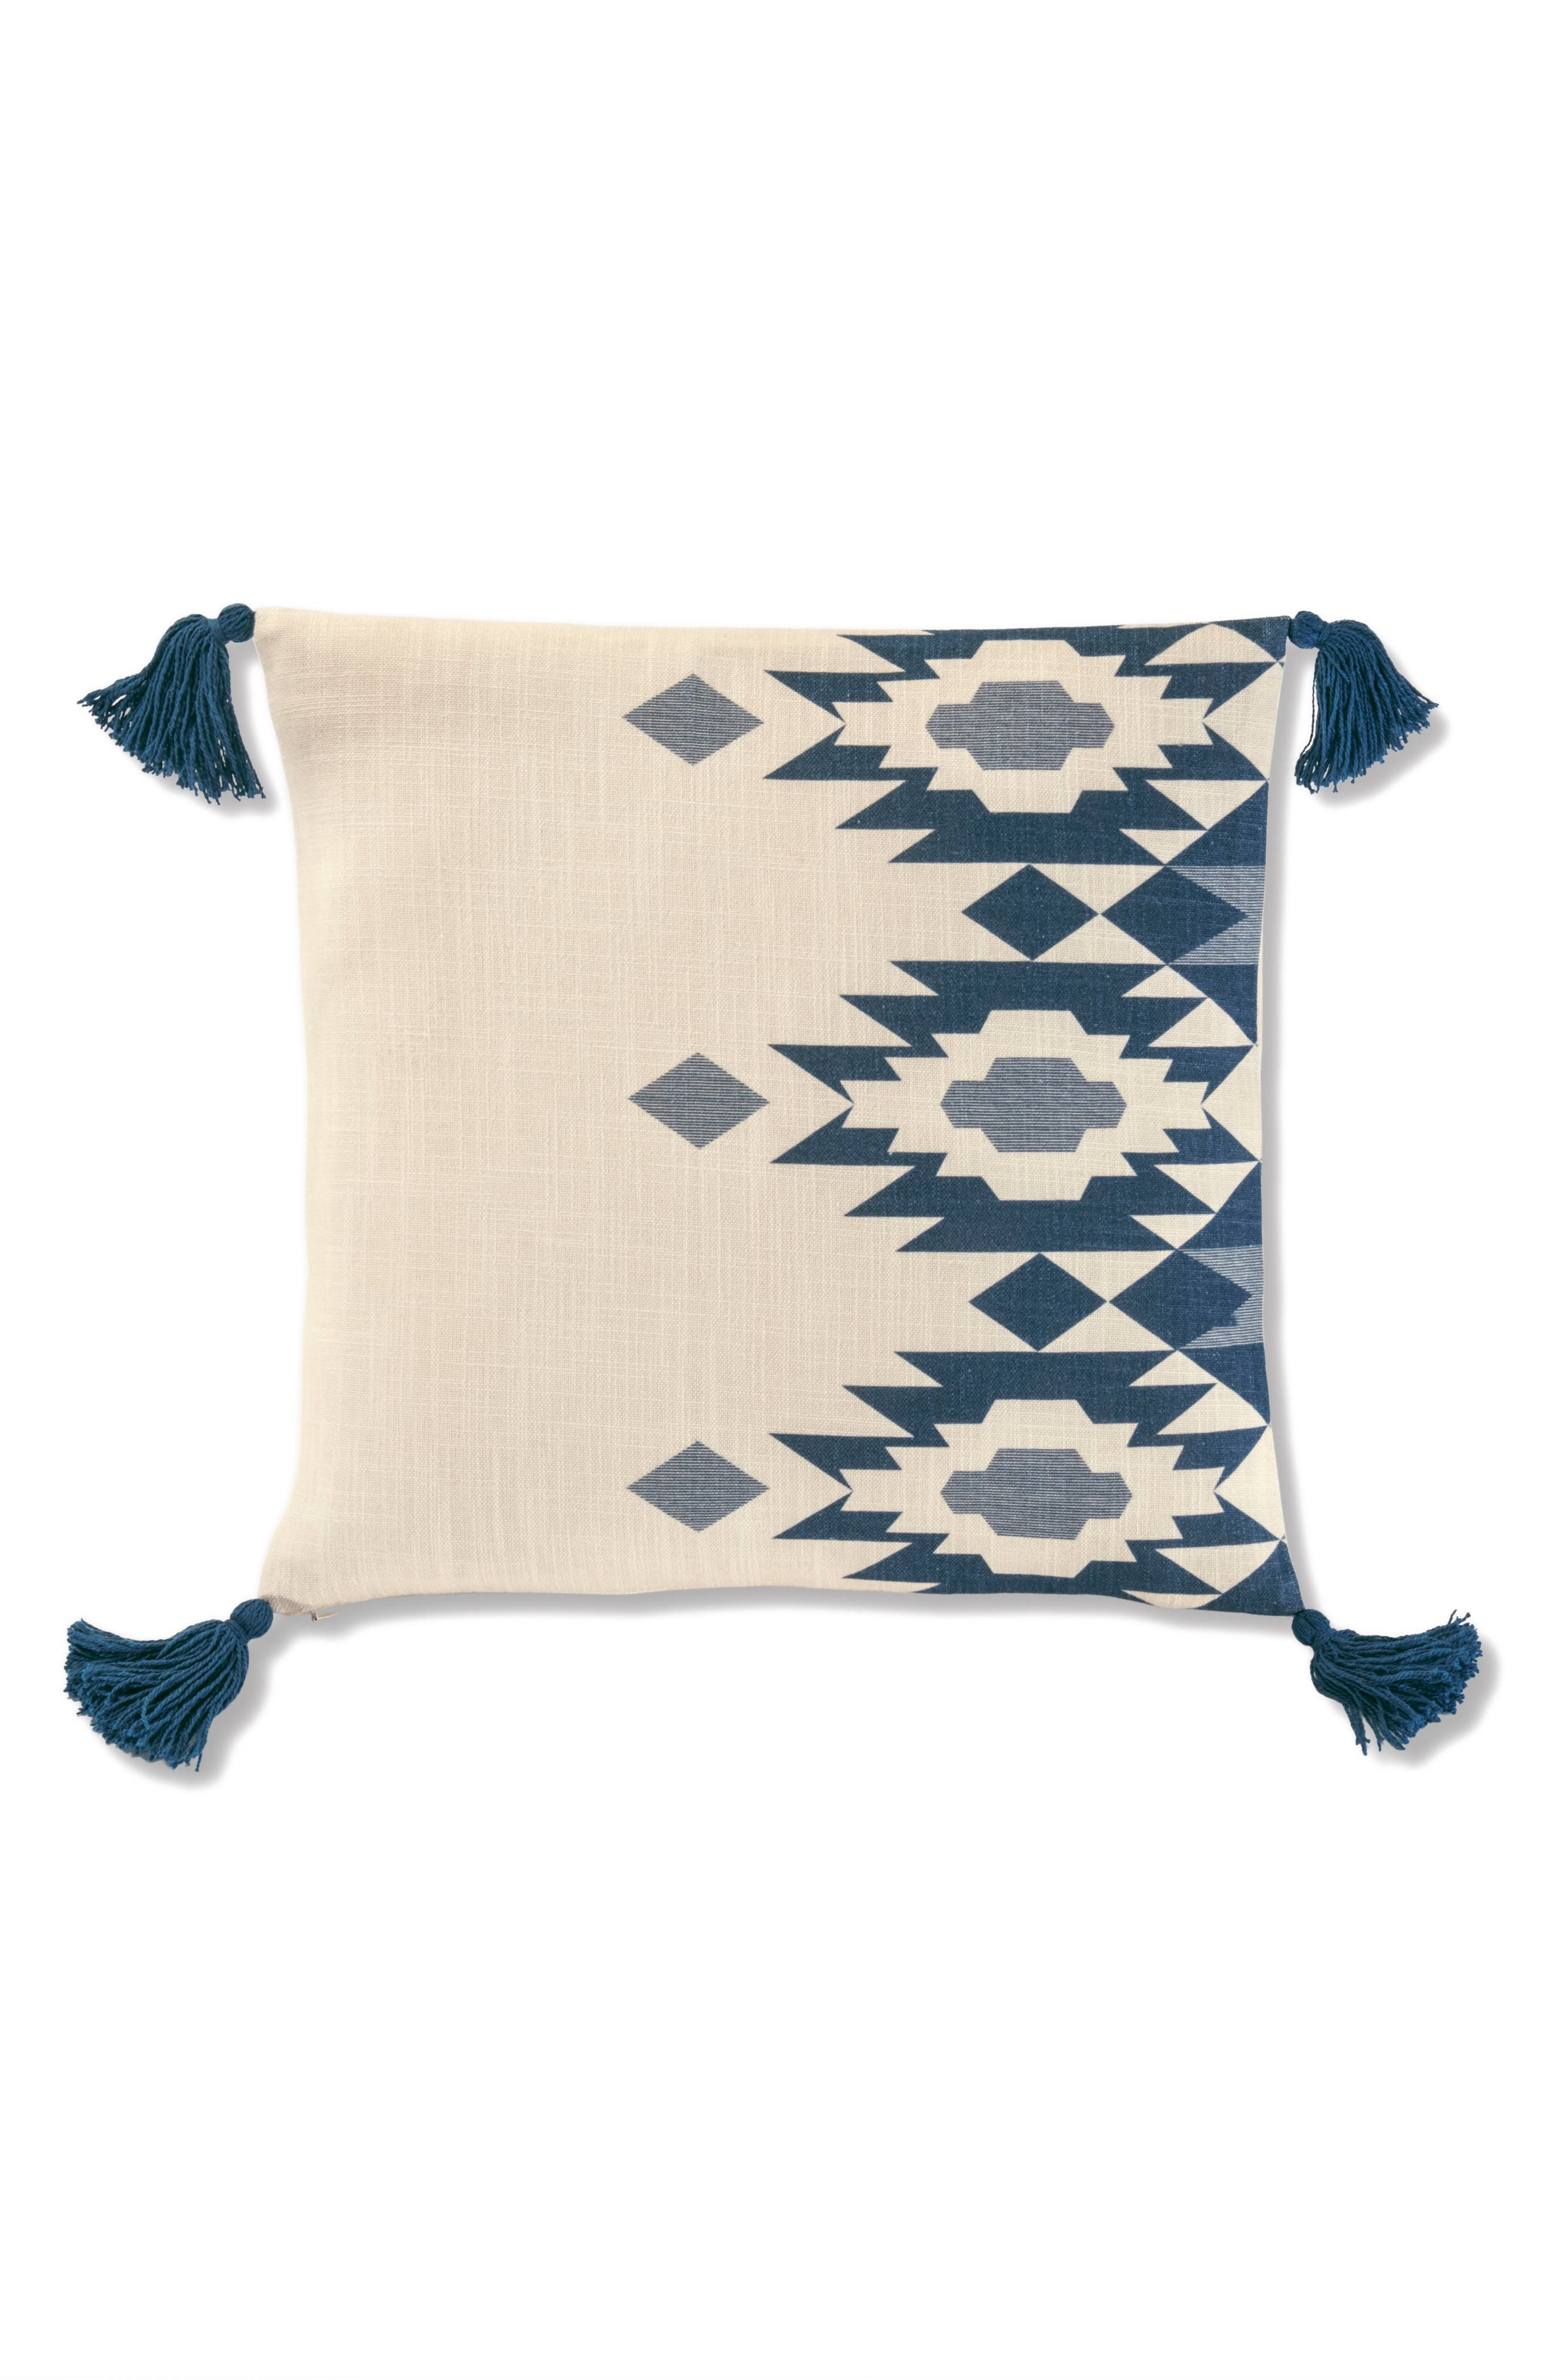 Yuma Star Printed Engineered Accent Pillow,                             Main thumbnail 1, color,                             BLUE